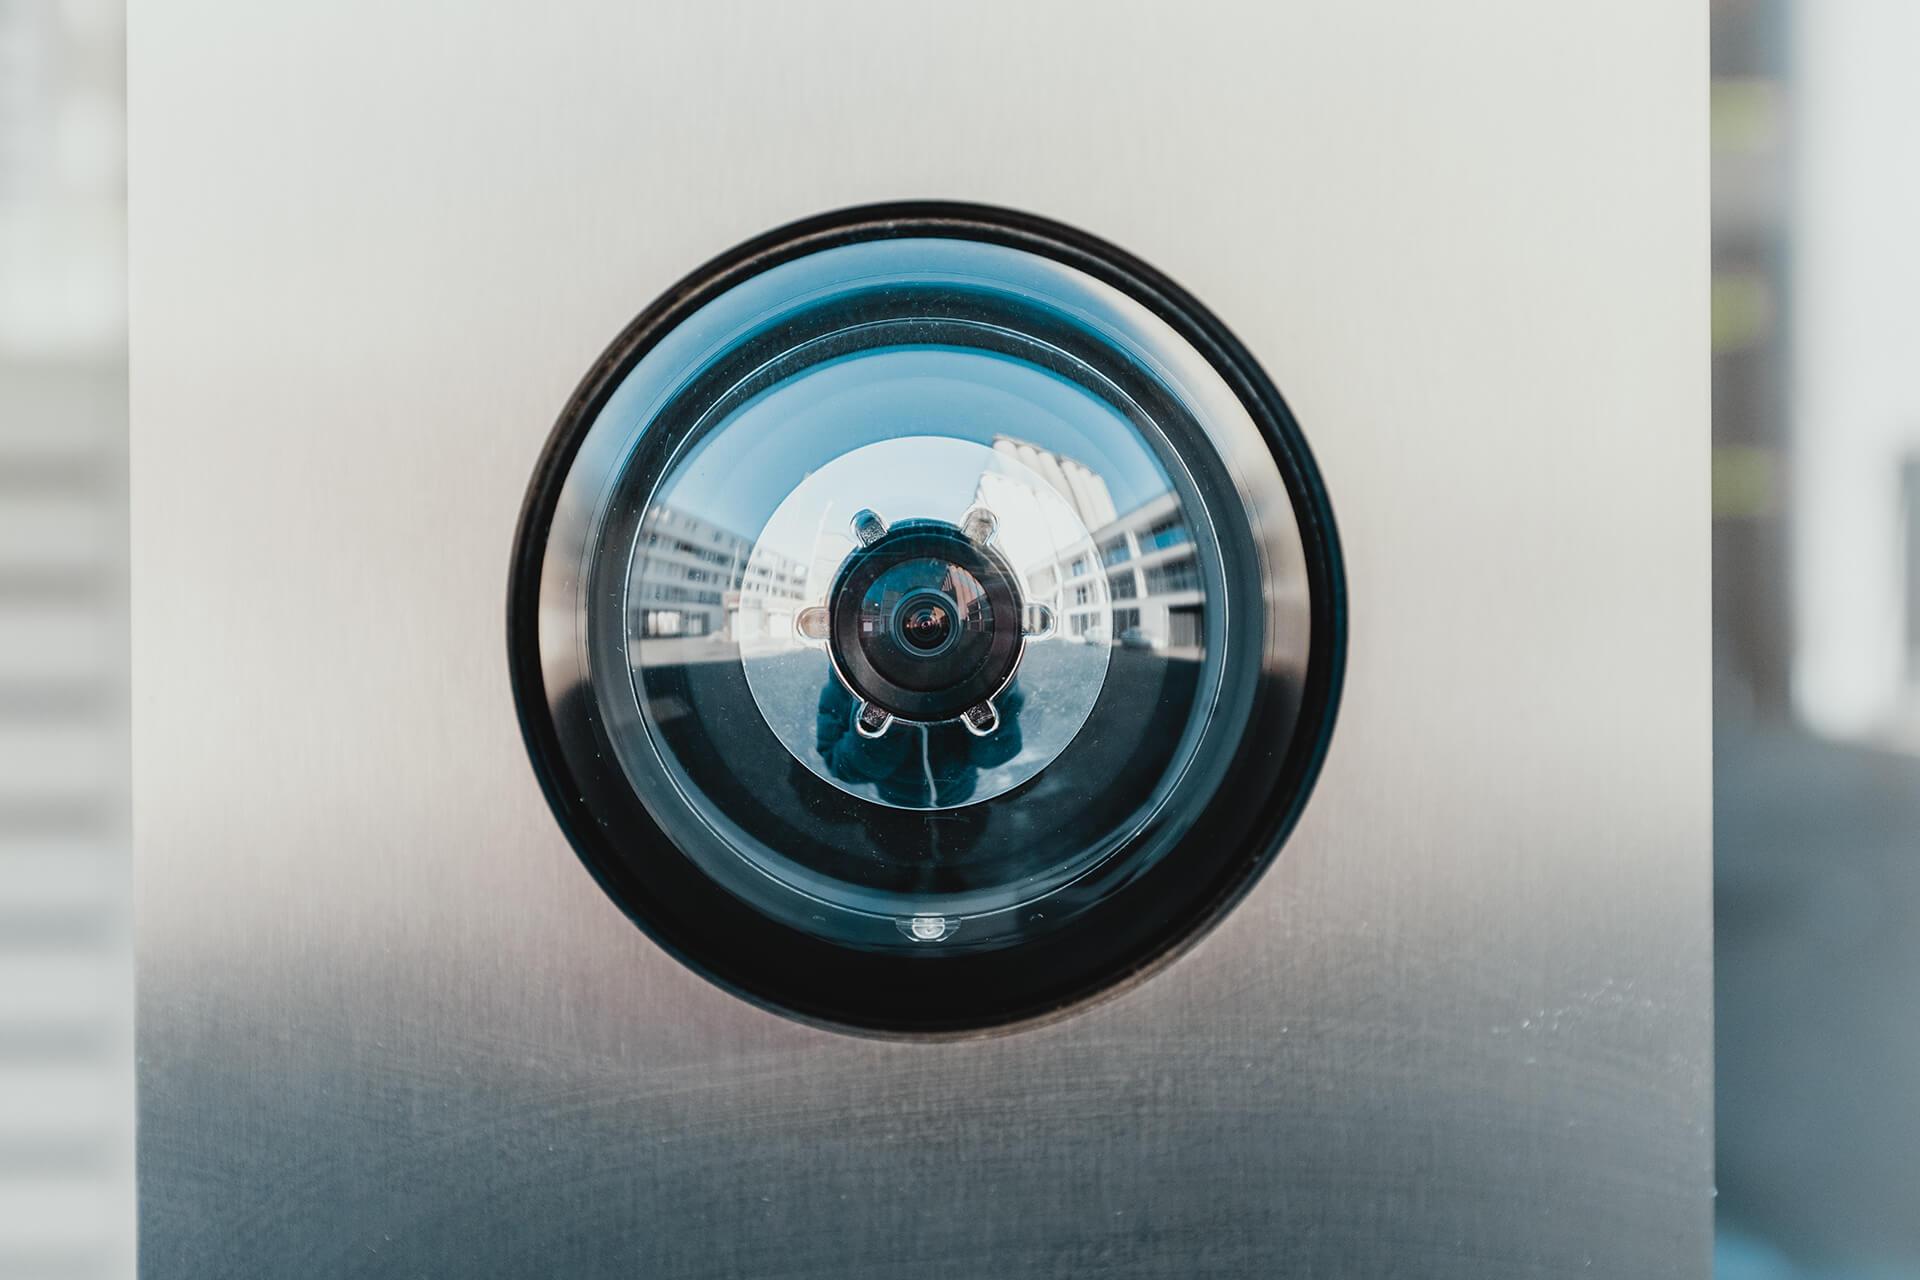 A circular security camera mounted on a wall